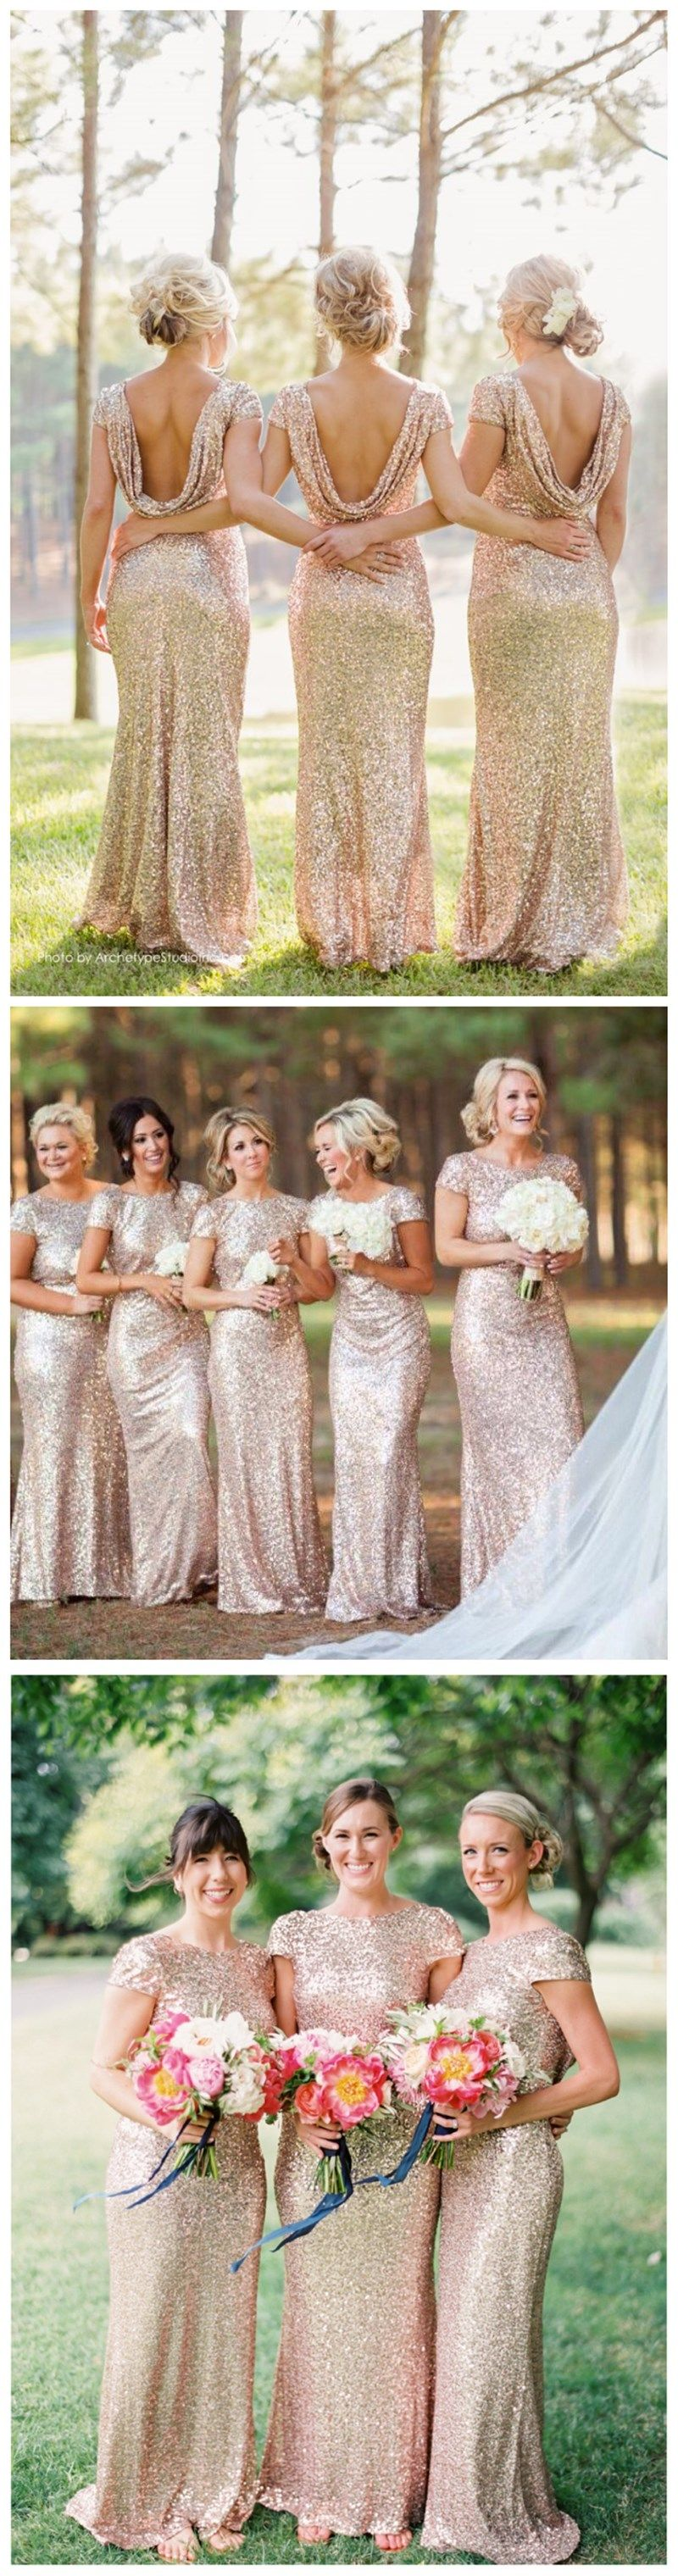 Sparkle bridesmaid dress long brid wedding ideas pinterest sparkle bridesmaid dress long brid ombrellifo Gallery